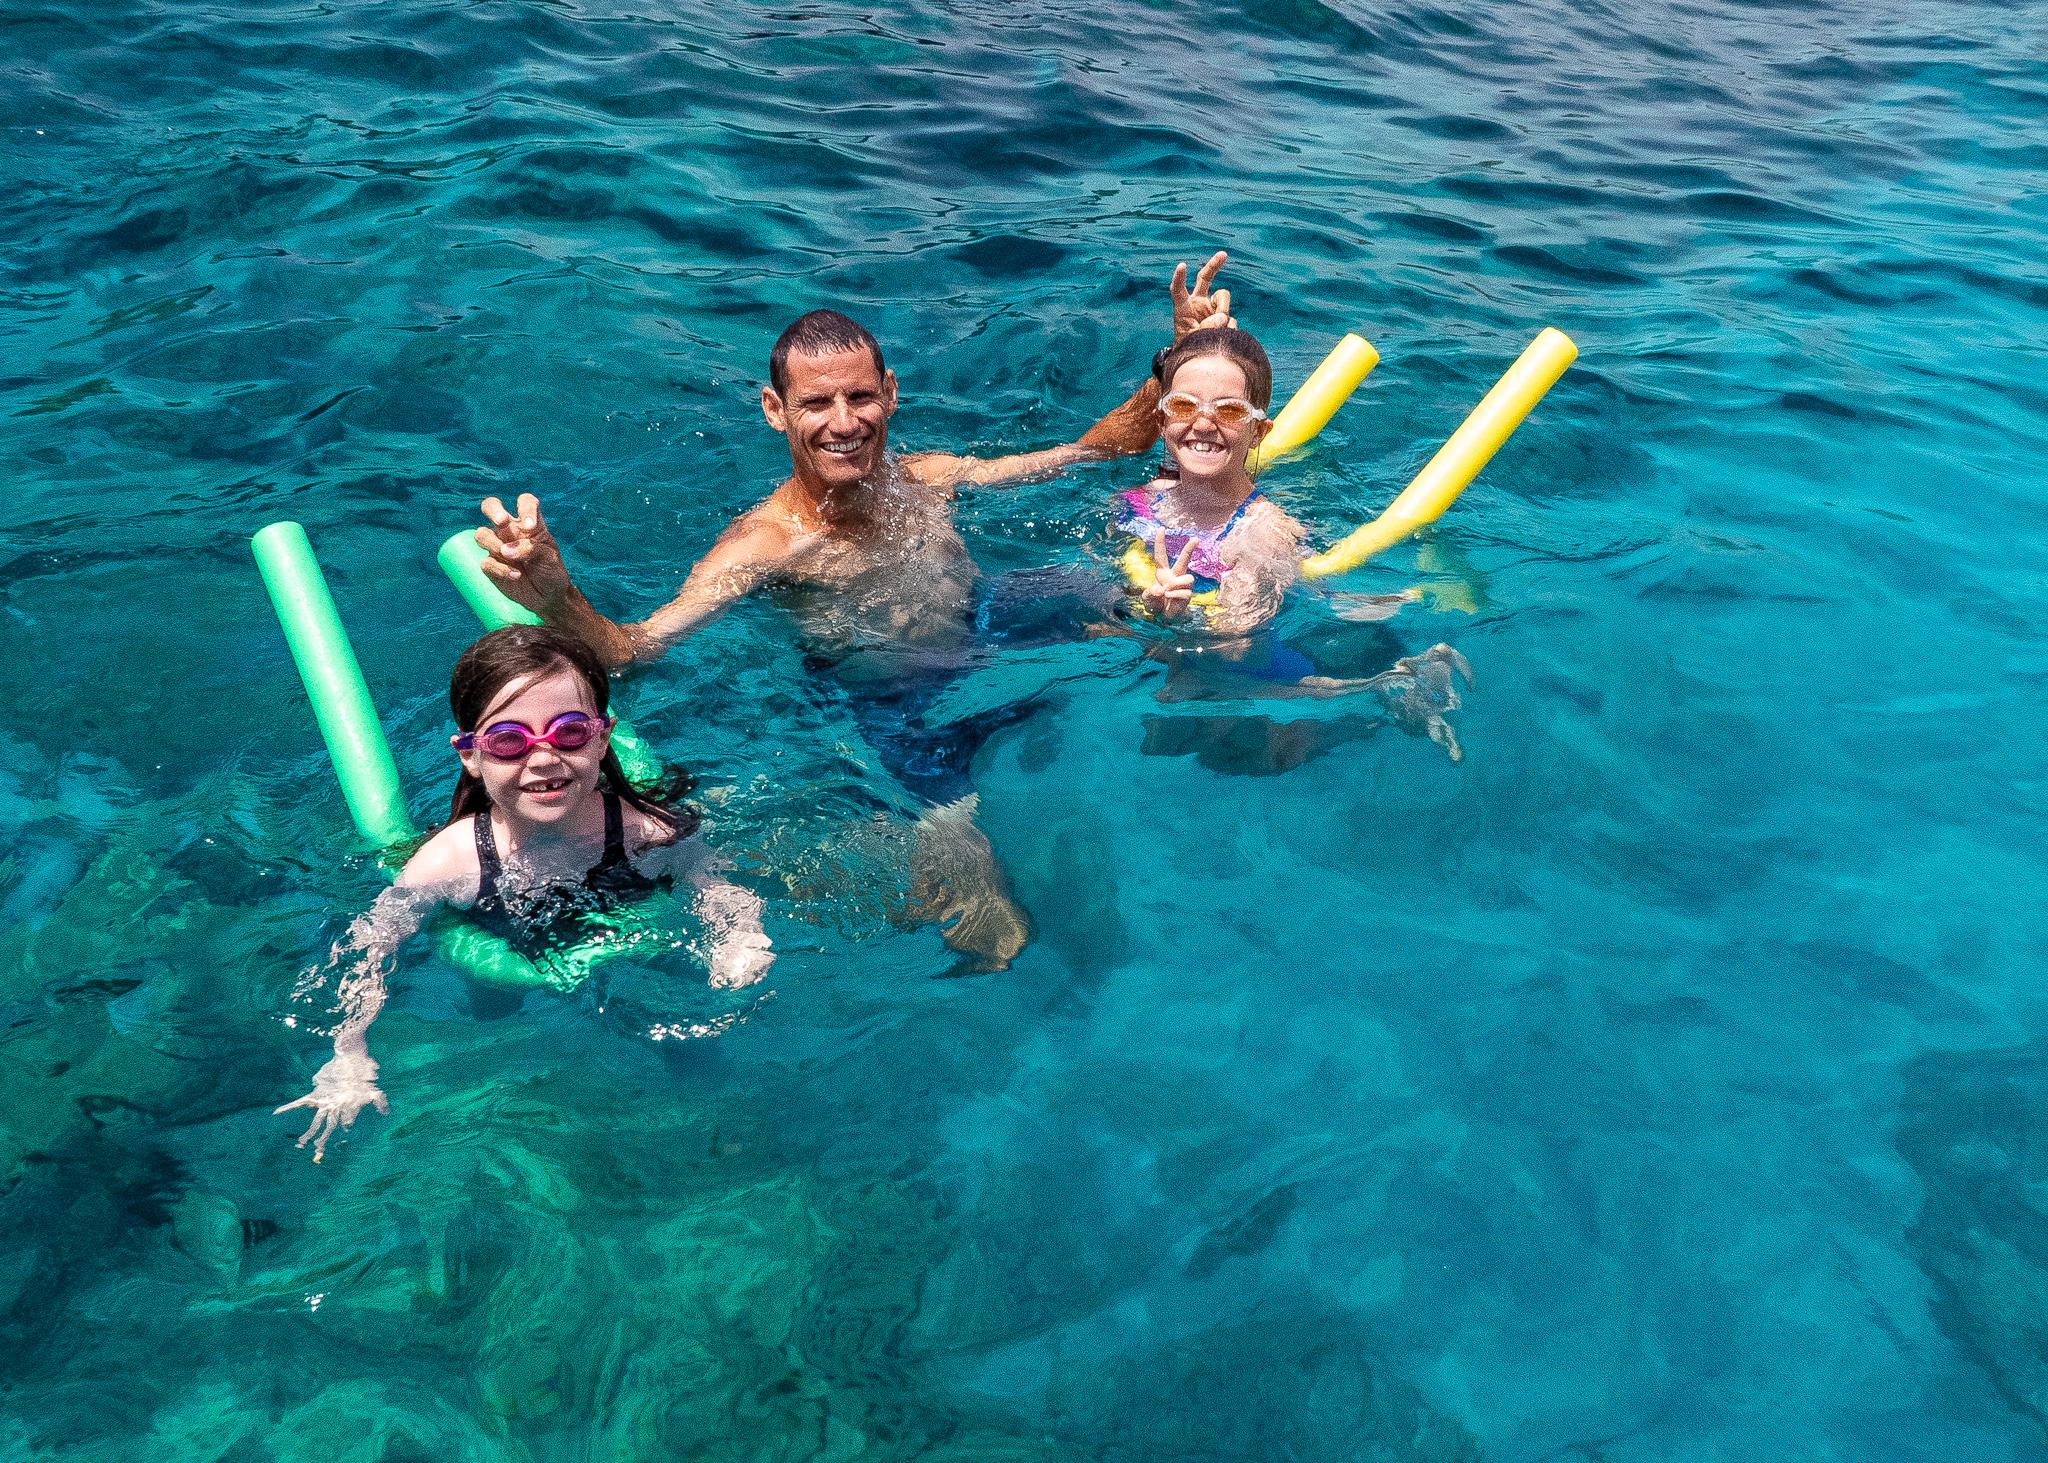 Splashing around in the Blue Lagoon